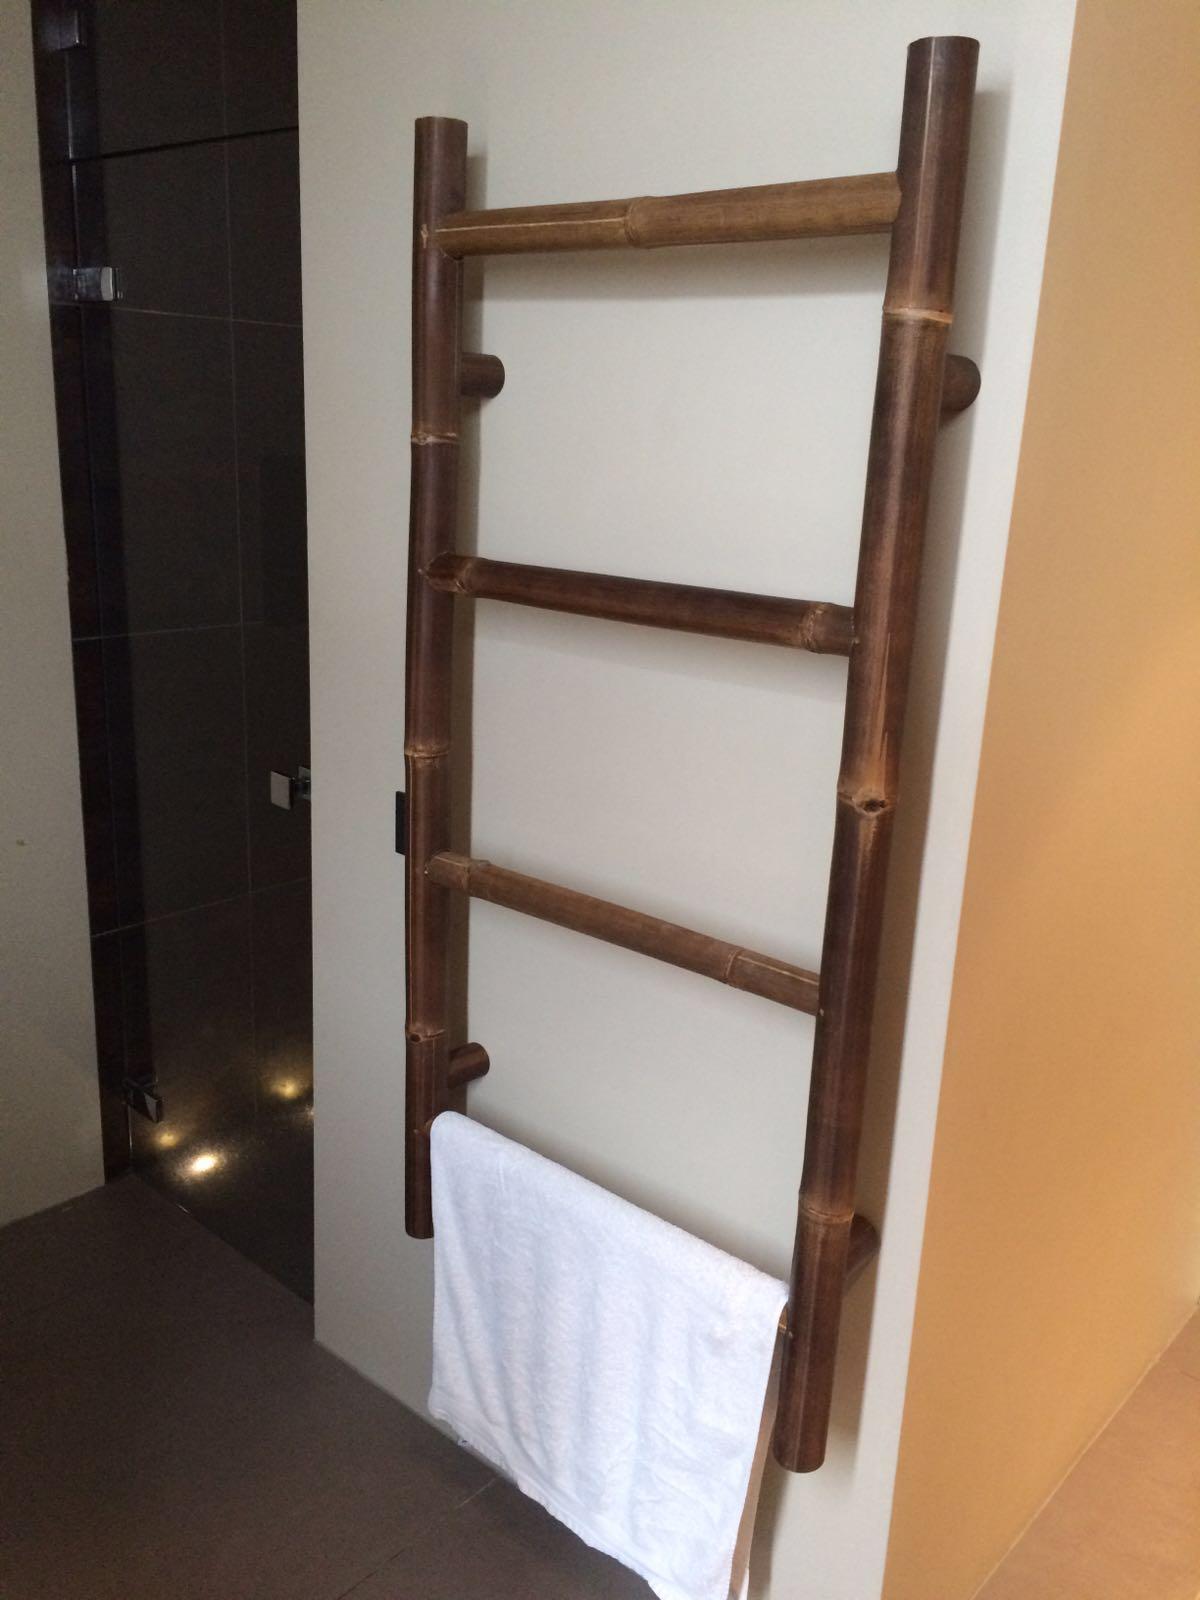 Bamboebeddeb en meubels voor slaapkamer, woonkamer, serre en tuin.